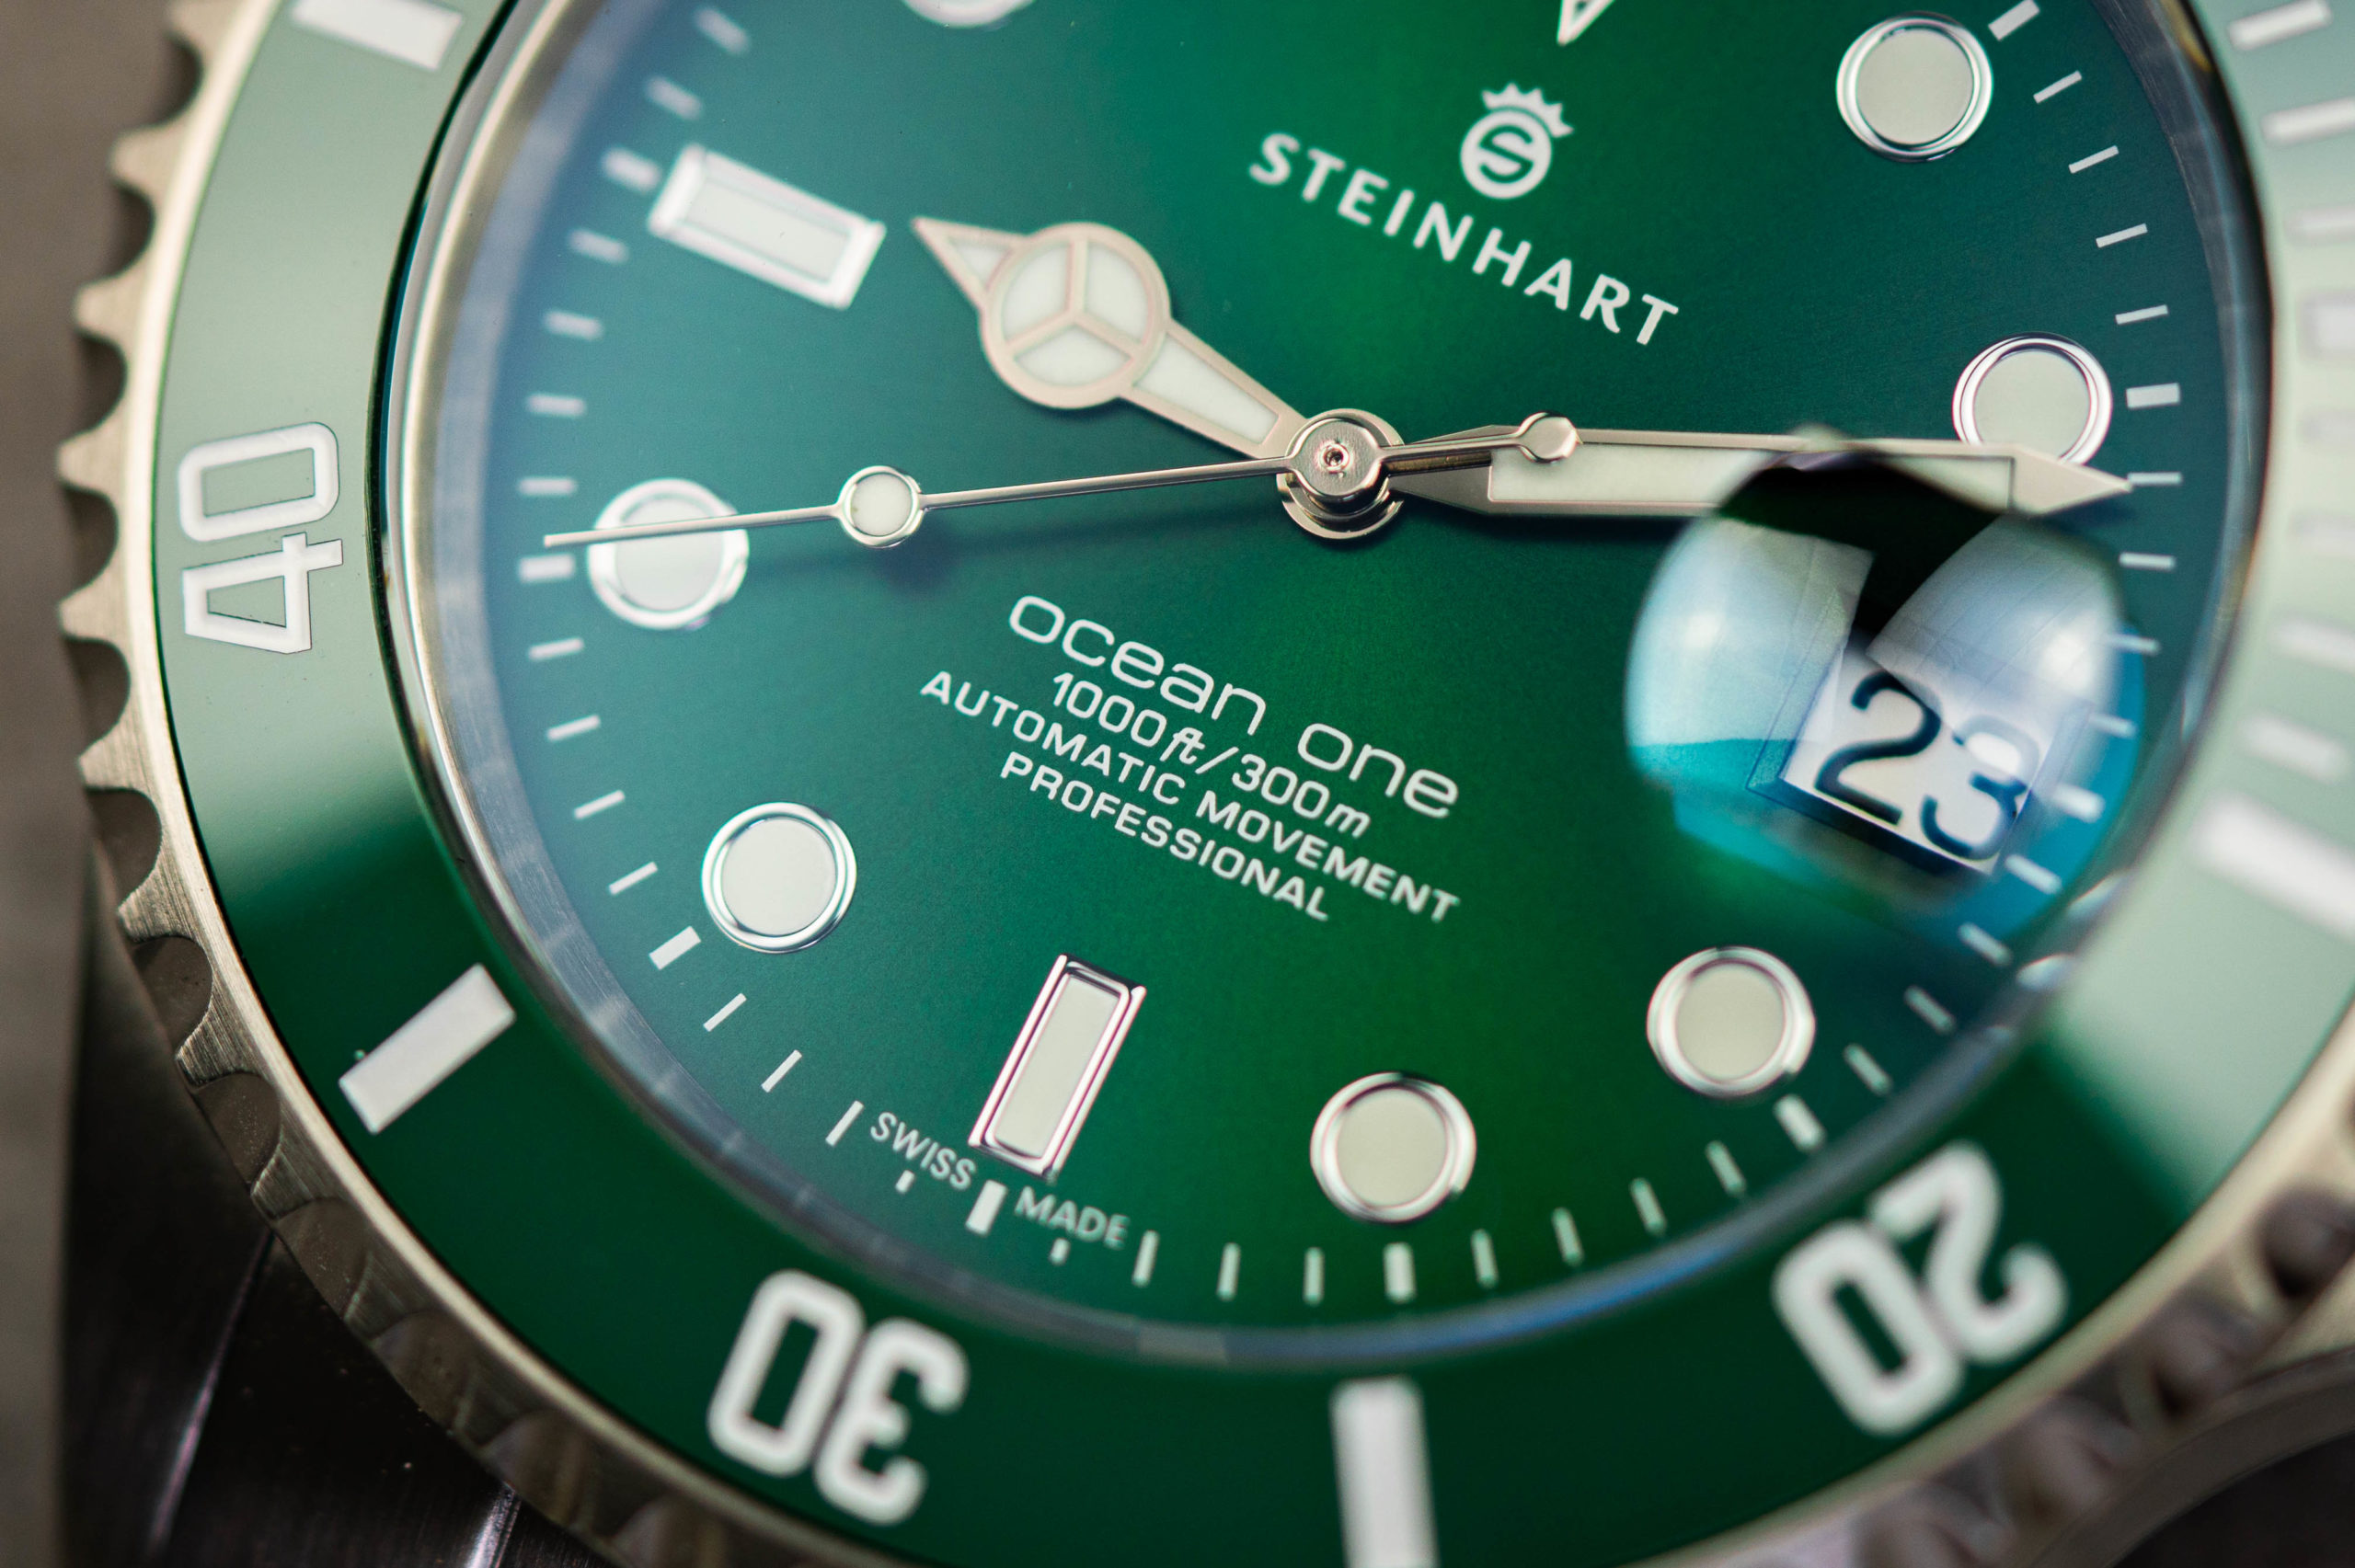 Steinhart-Ocean-One-Grün-Test